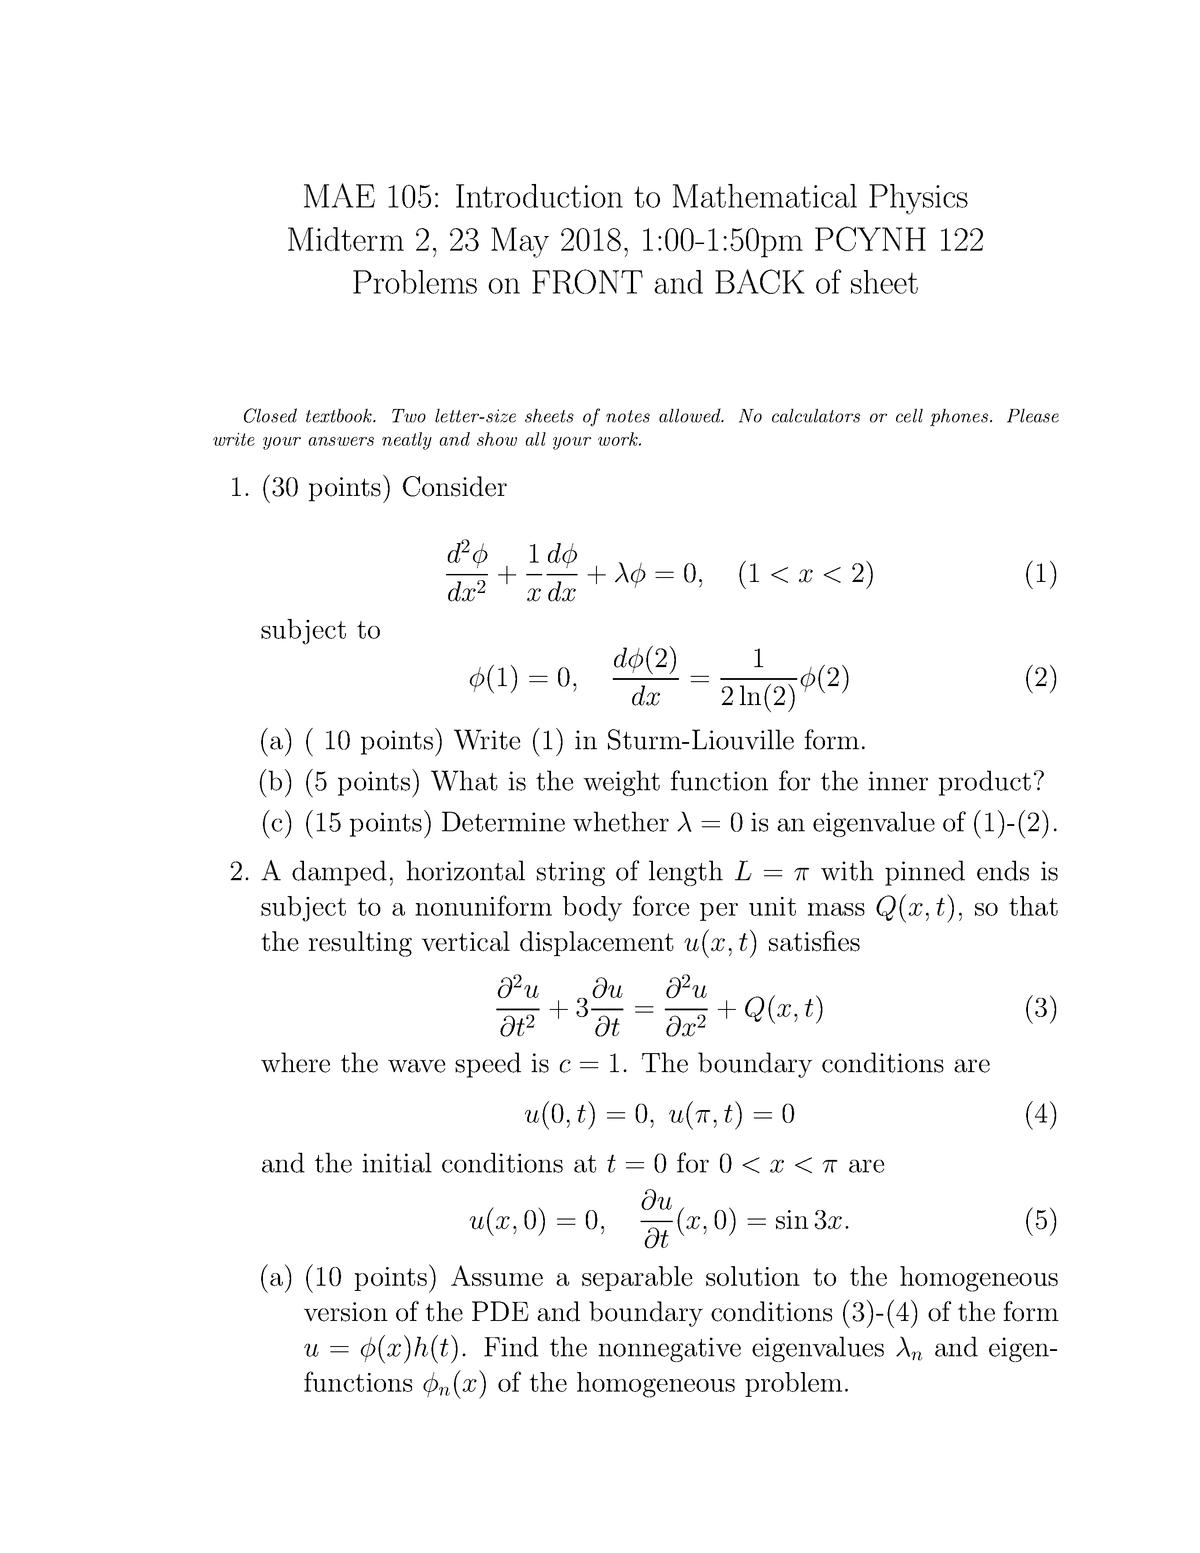 Exam 2018 - MAE 105: Introduction to Mathematical Physics